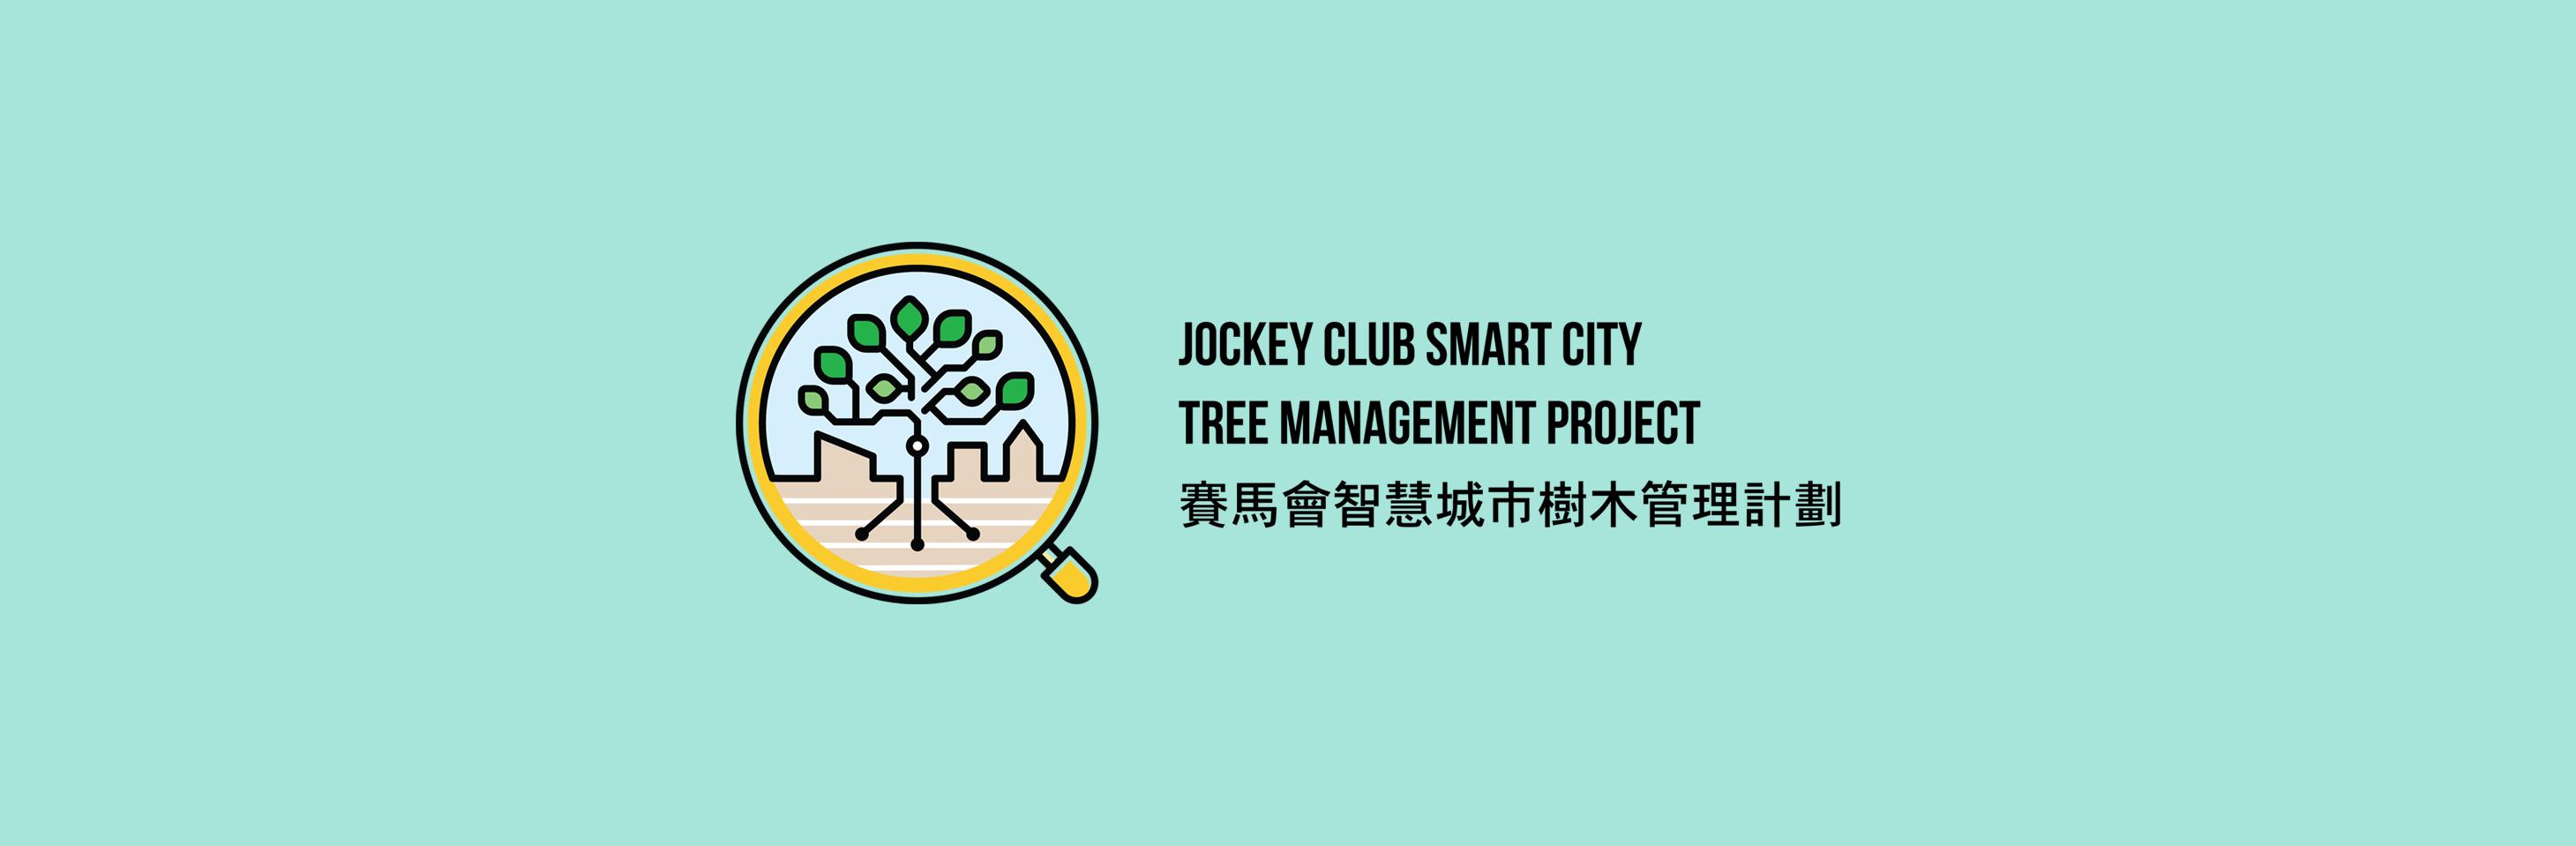 Jockey Club Smart City Tree Management Project